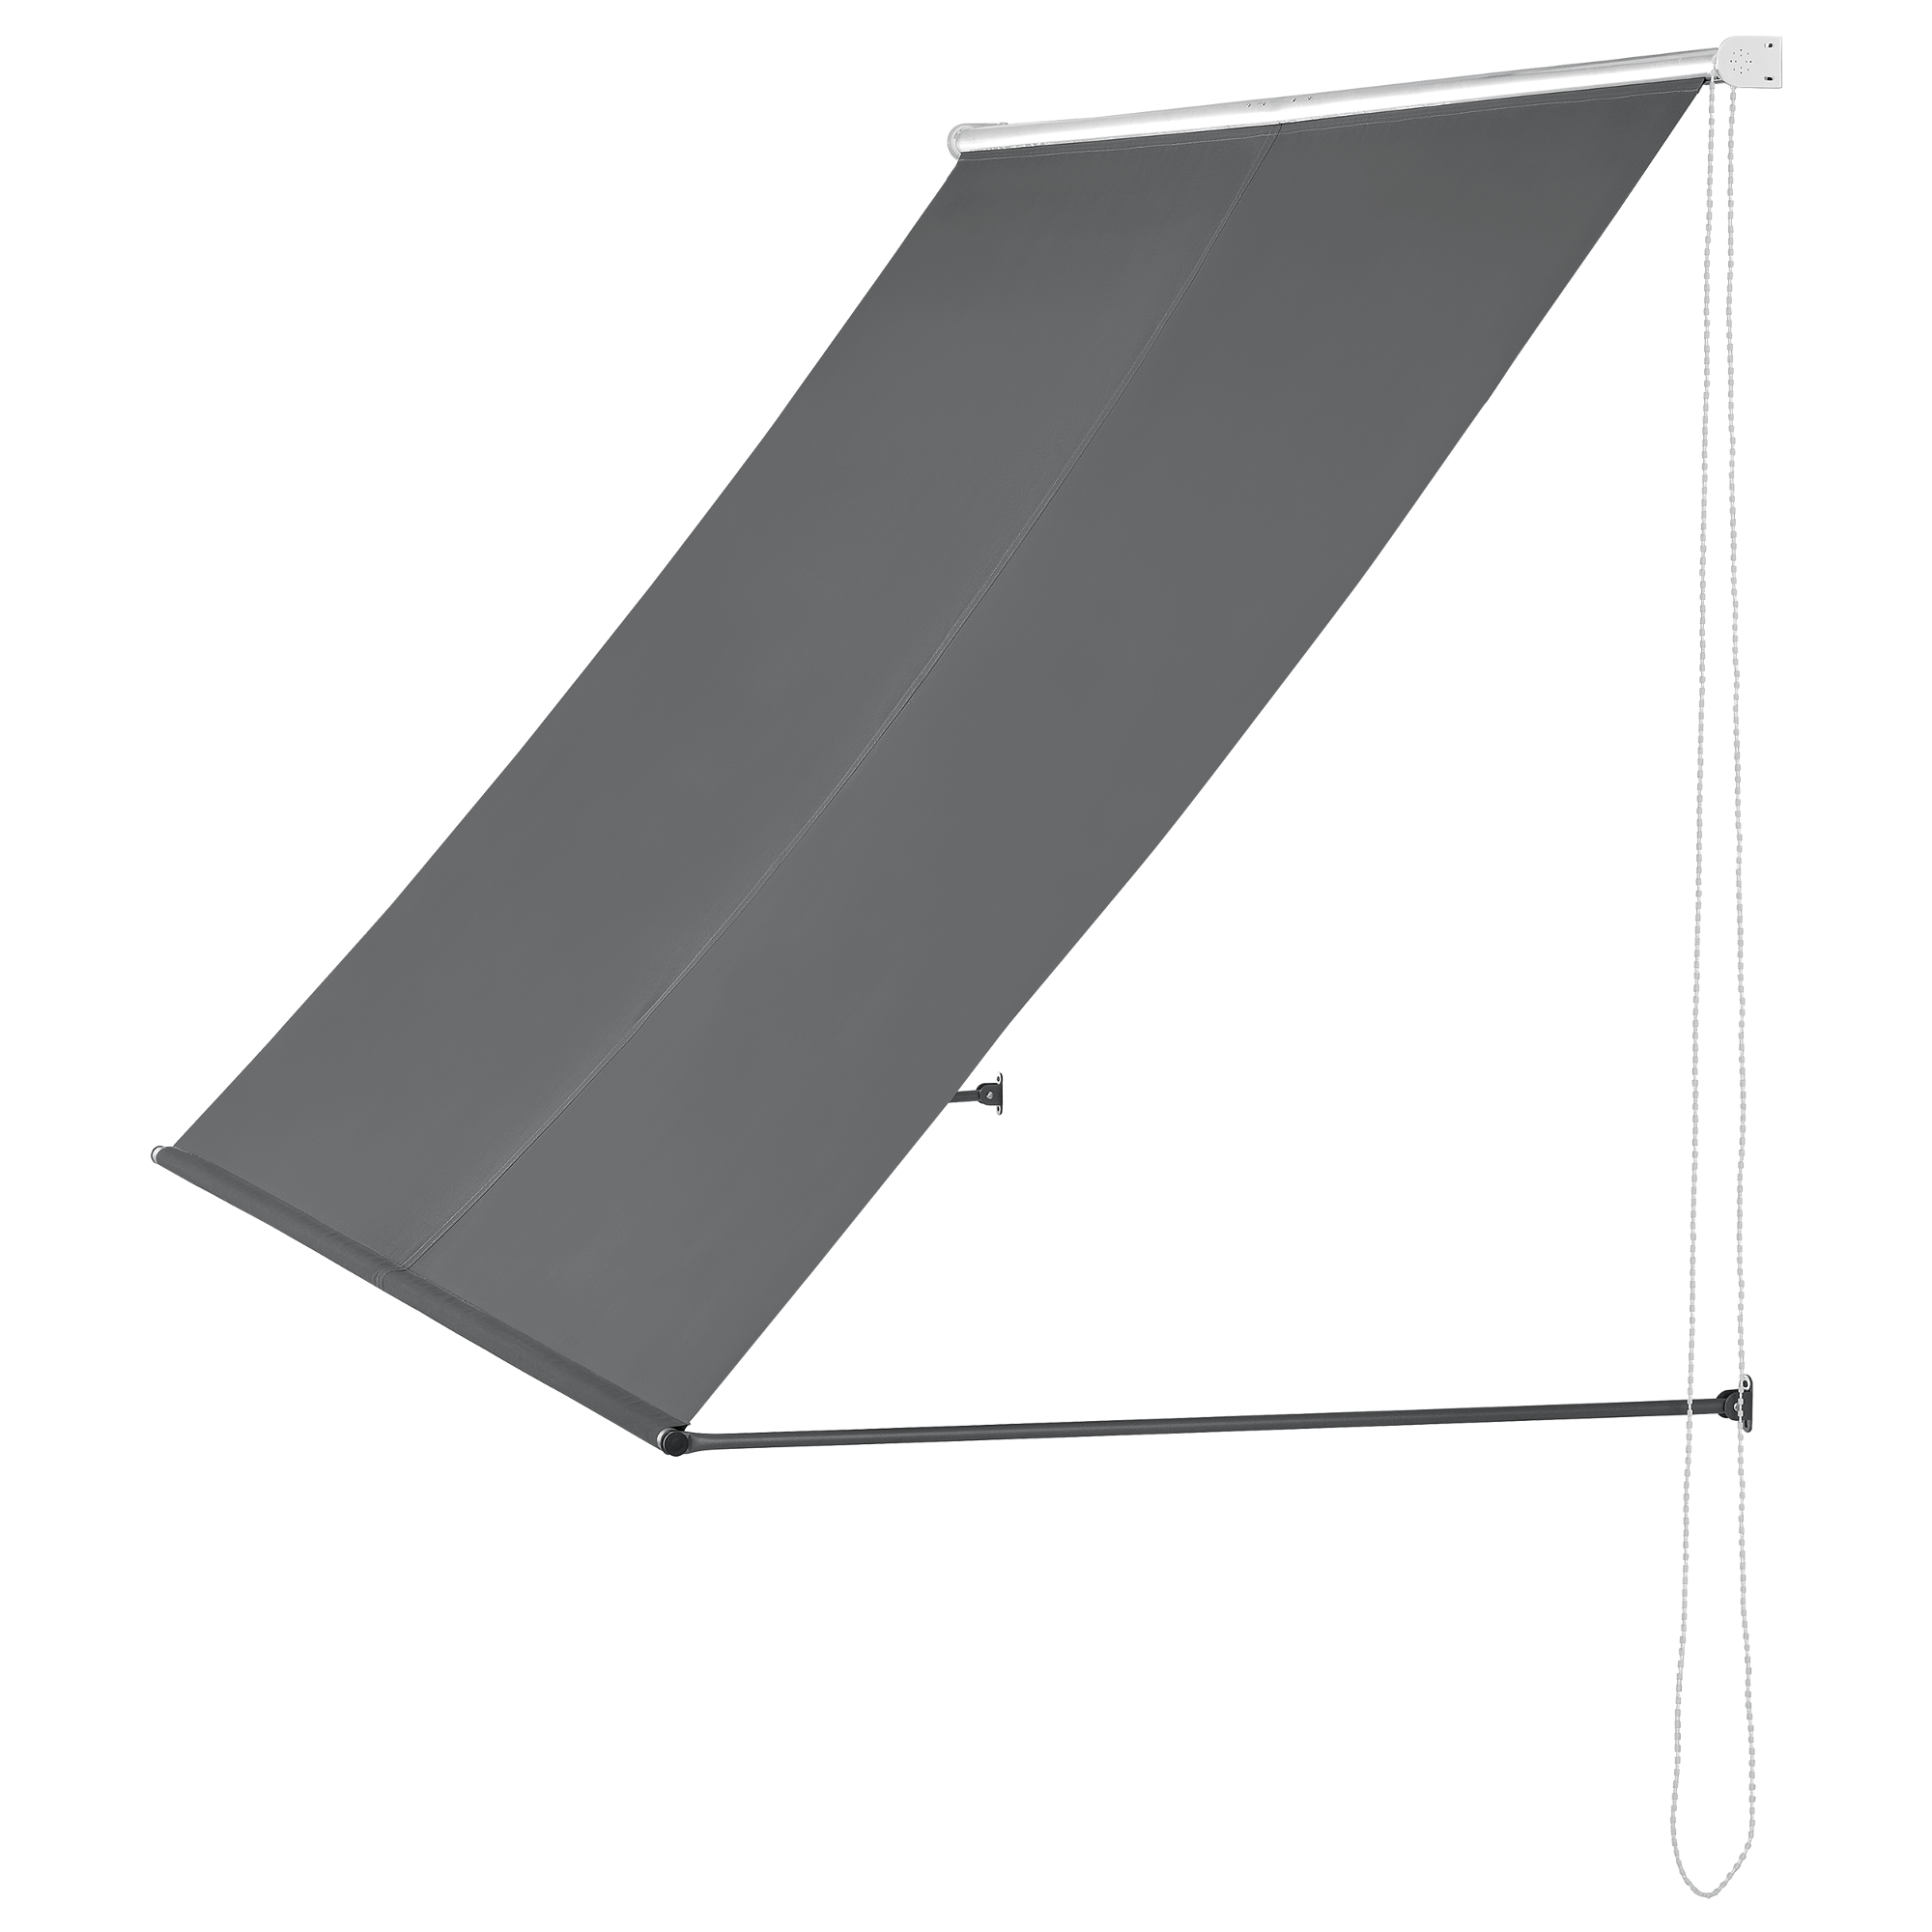 markise sonnenschutz beschattung terrasse garten. Black Bedroom Furniture Sets. Home Design Ideas